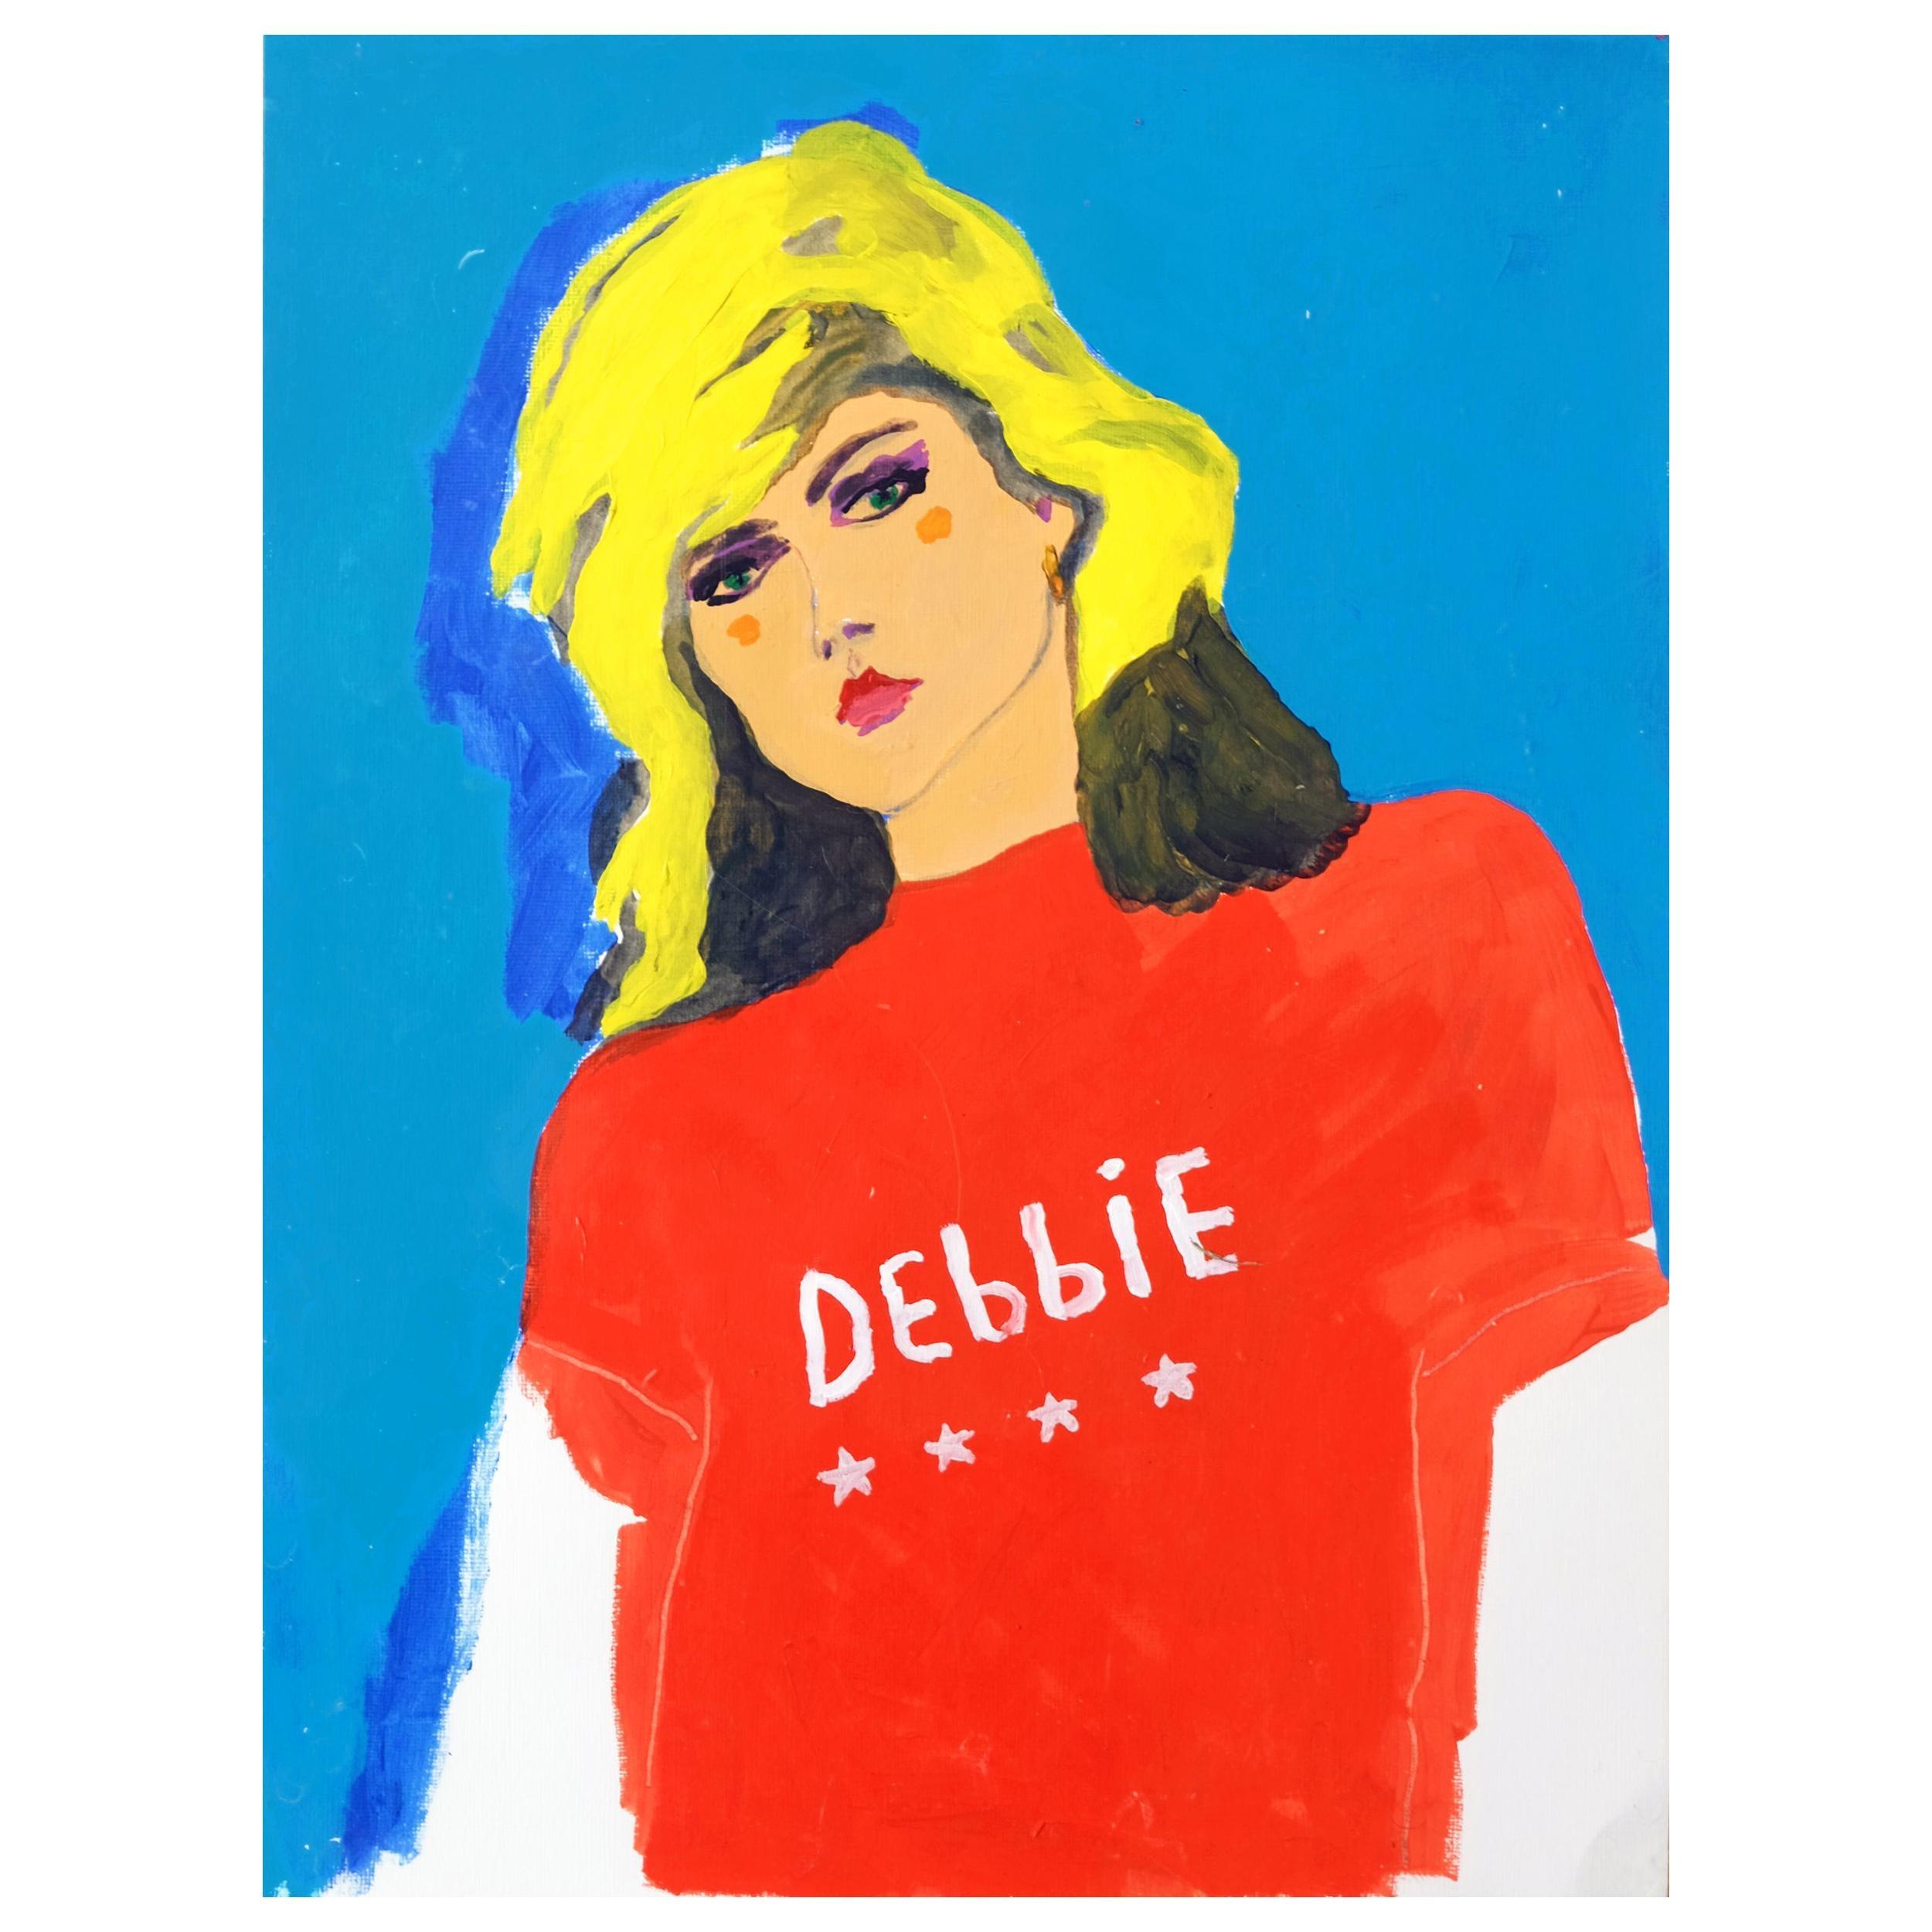 'Debbie Harry' Portrait Painting by Alan Fears Acrylic on Paper